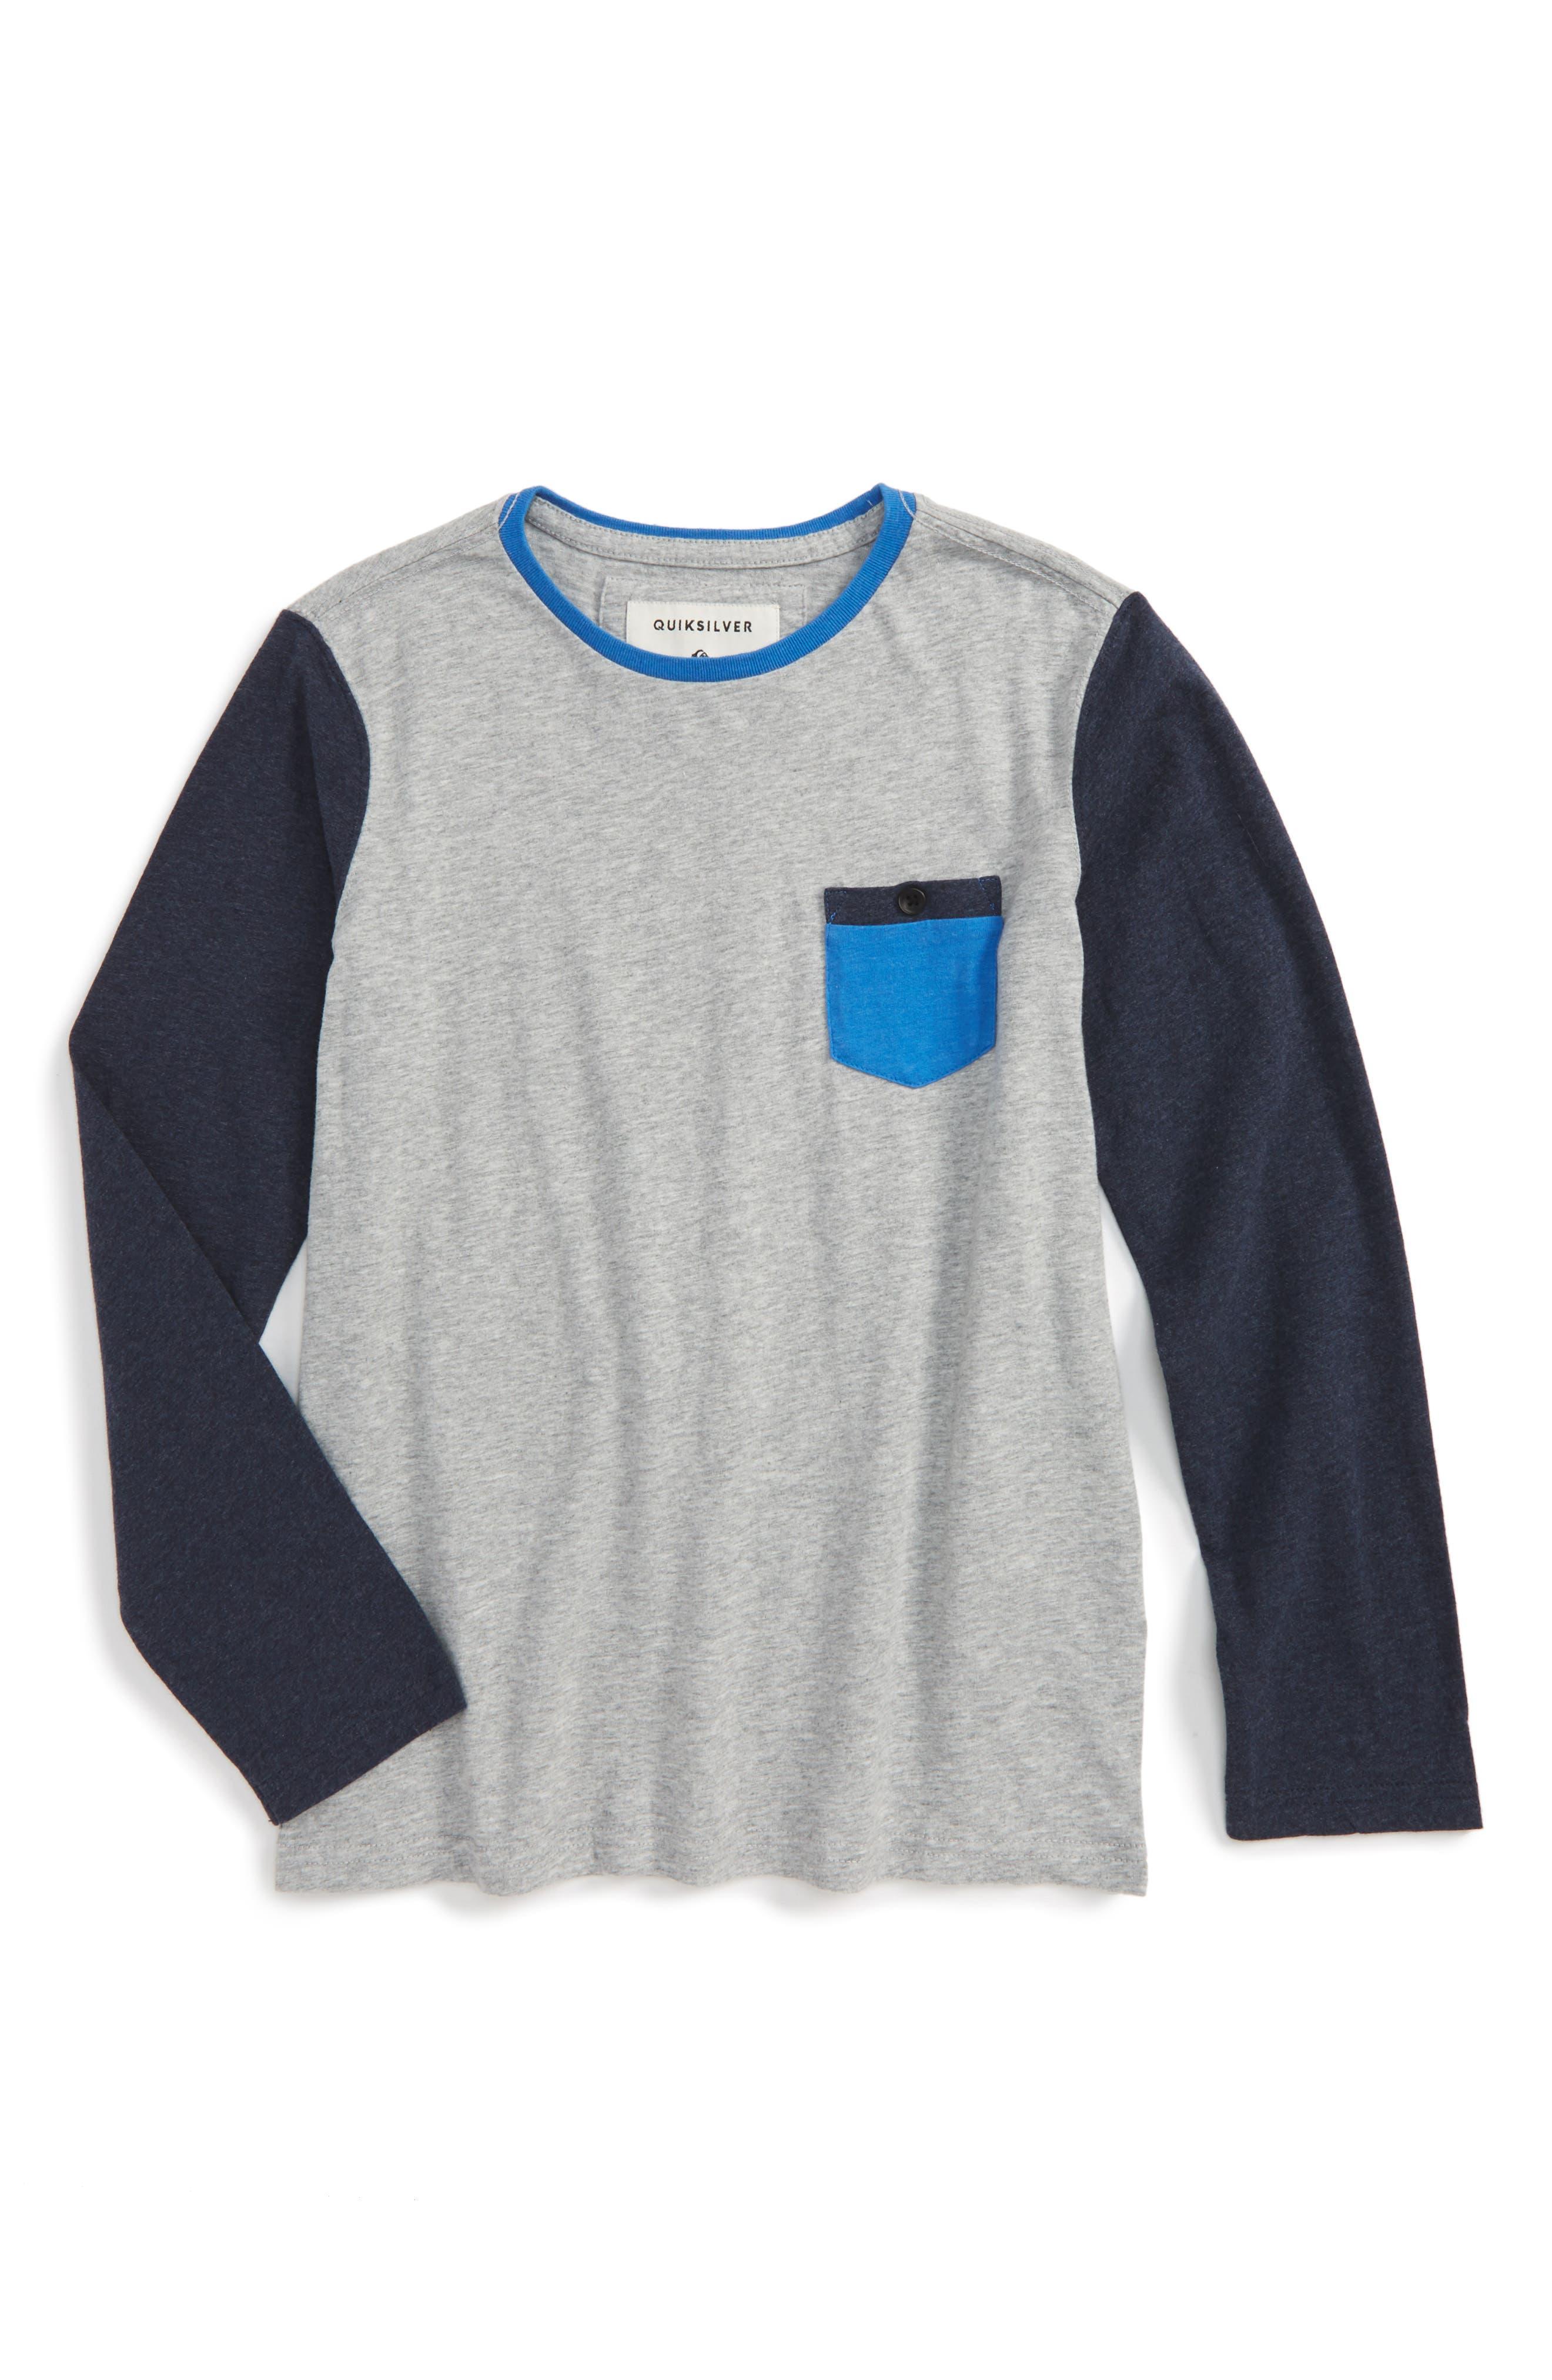 Quiksilver Baysic Pocket T-Shirt (Big Boys)